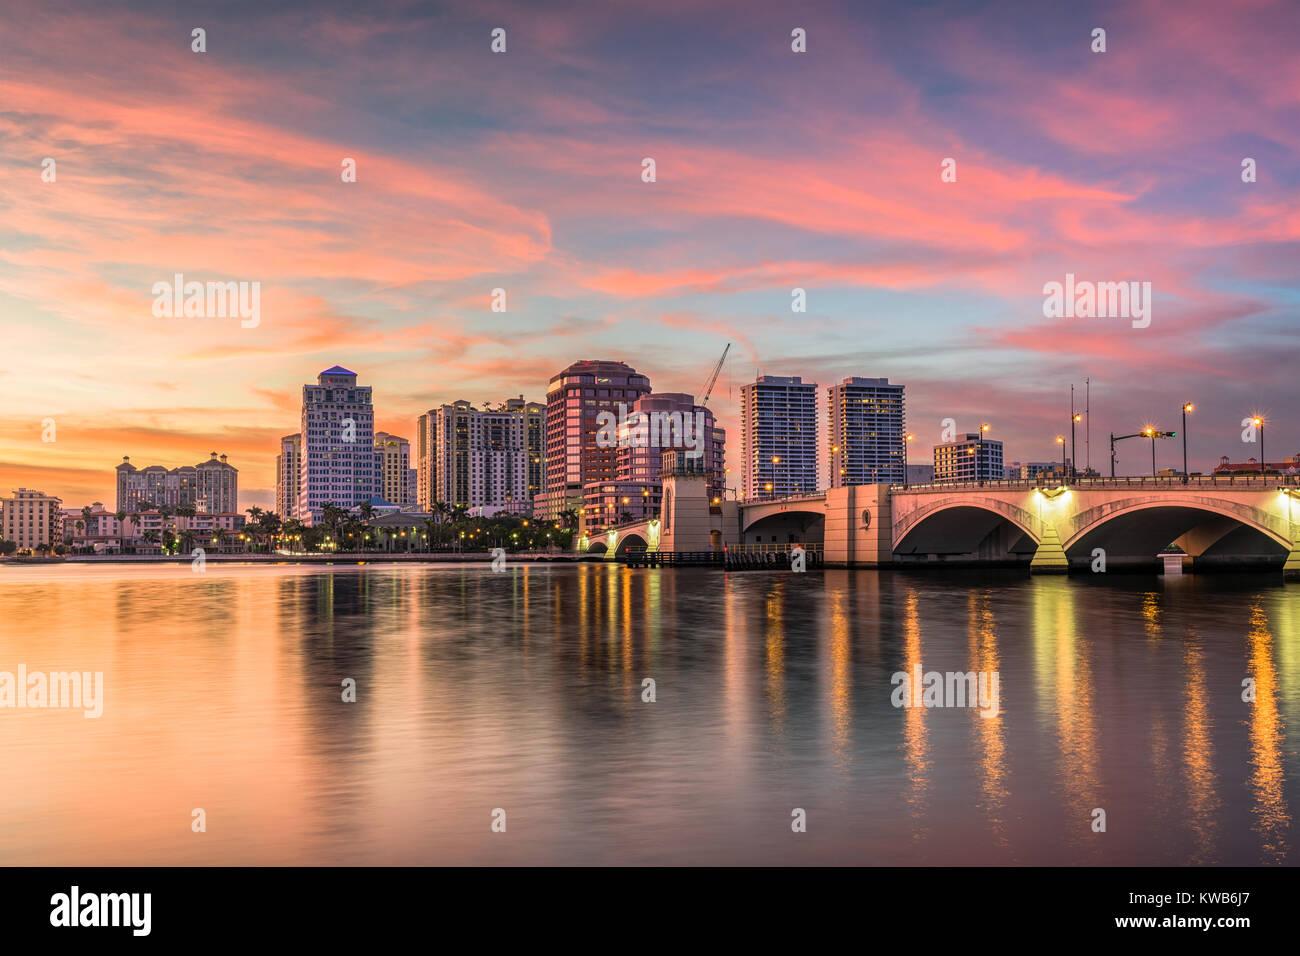 West Palm Beach, Florida, USA downtown skyline on the intracoastal waterway. - Stock Image